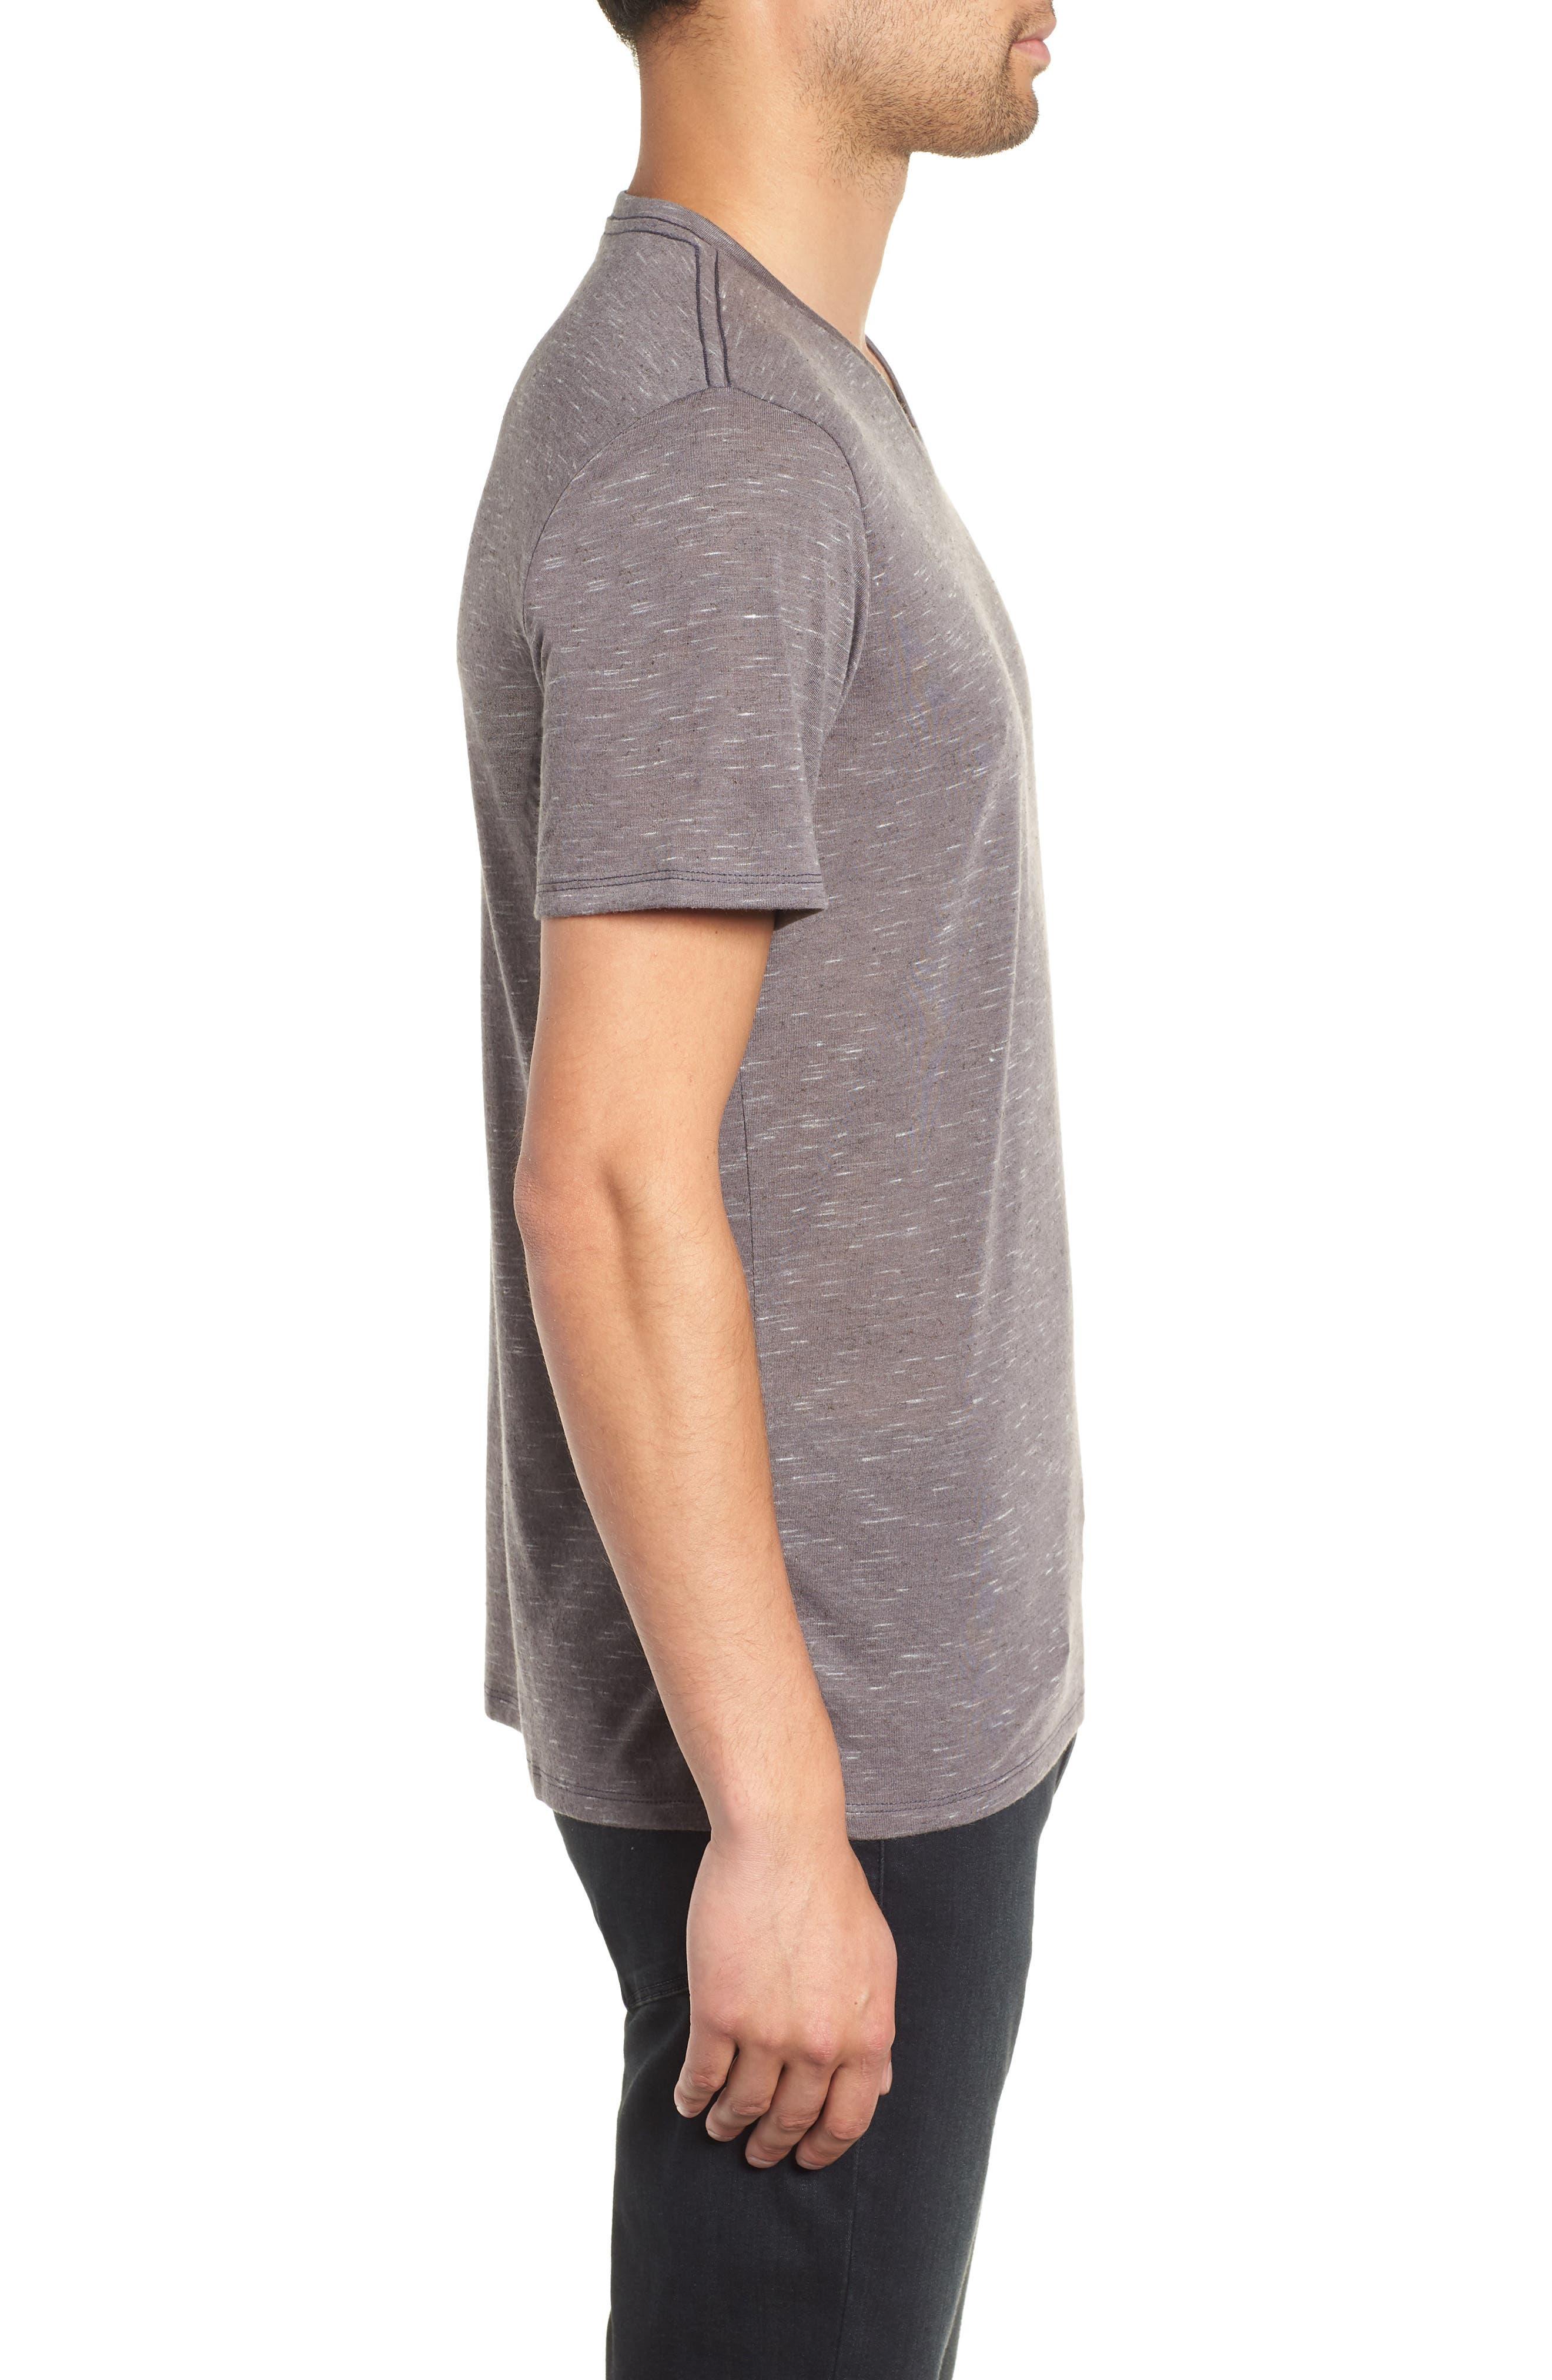 THE RAIL, Streaky V-Neck T-Shirt, Alternate thumbnail 3, color, GREY TORNADO- WHITE